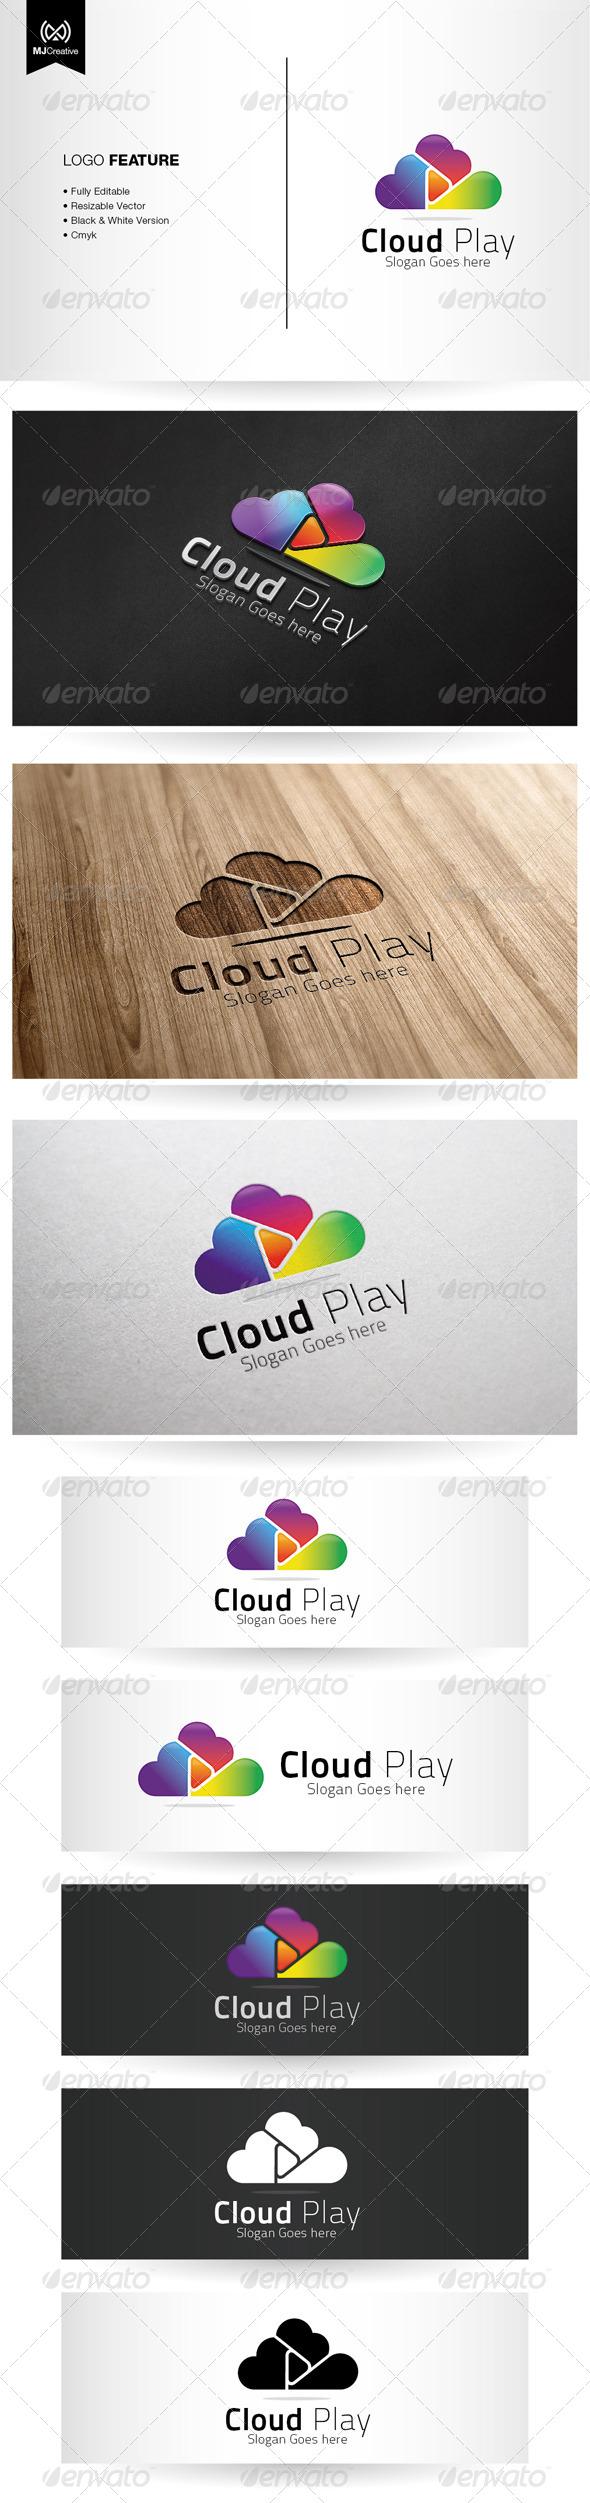 GraphicRiver Cloud Play Logo 5387576